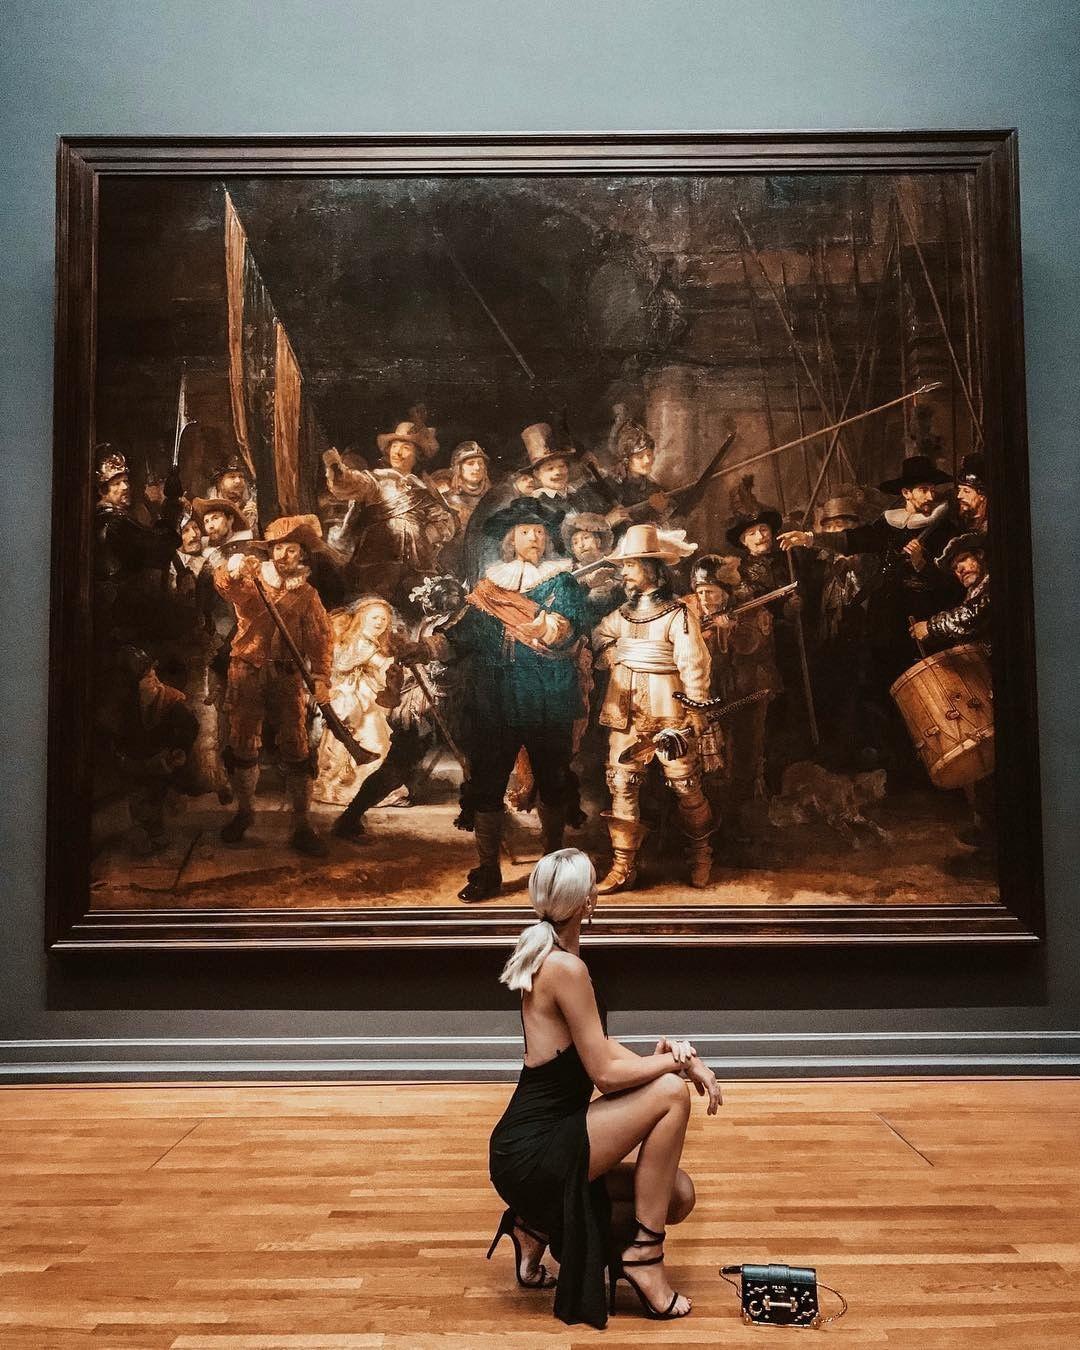 Amsterdam Rembrandt Night Watch P H O T O G R A P H Y